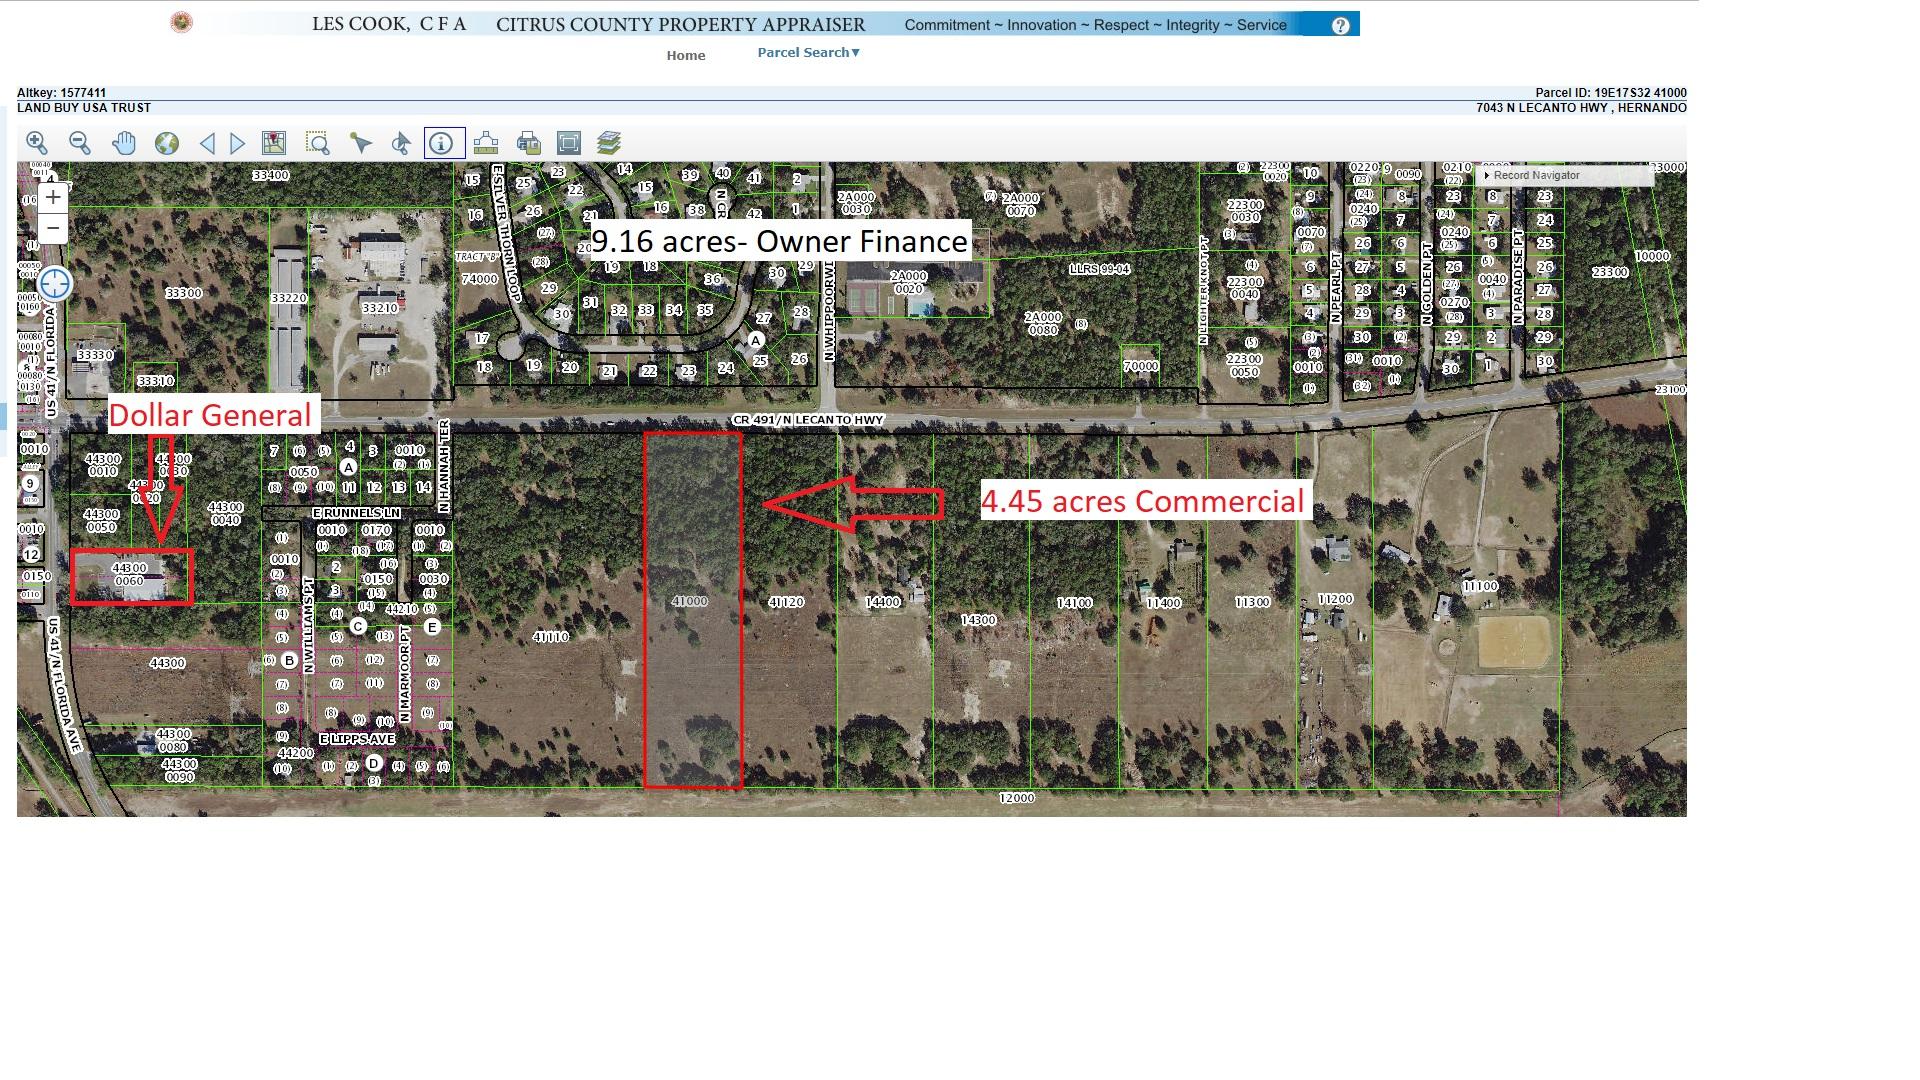 9 16 Acres Vacant Land Hernando Citrus County Florida